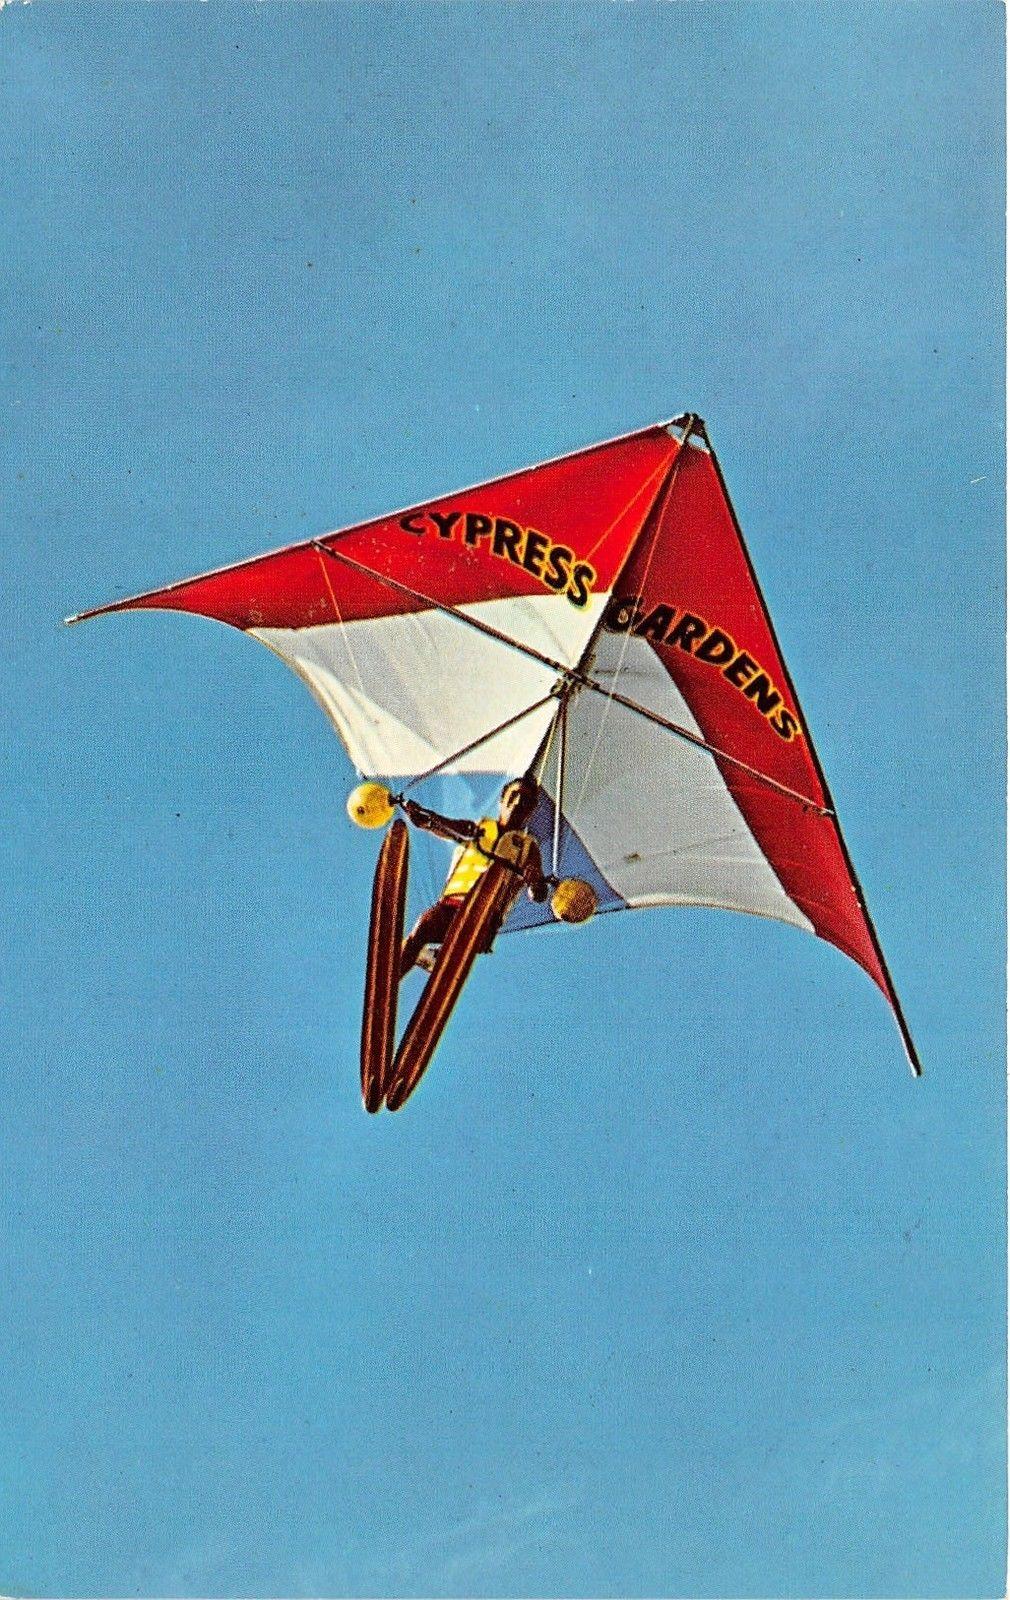 Winter Haven Florida~Cypress Gardens Delta Wing Kite~Man